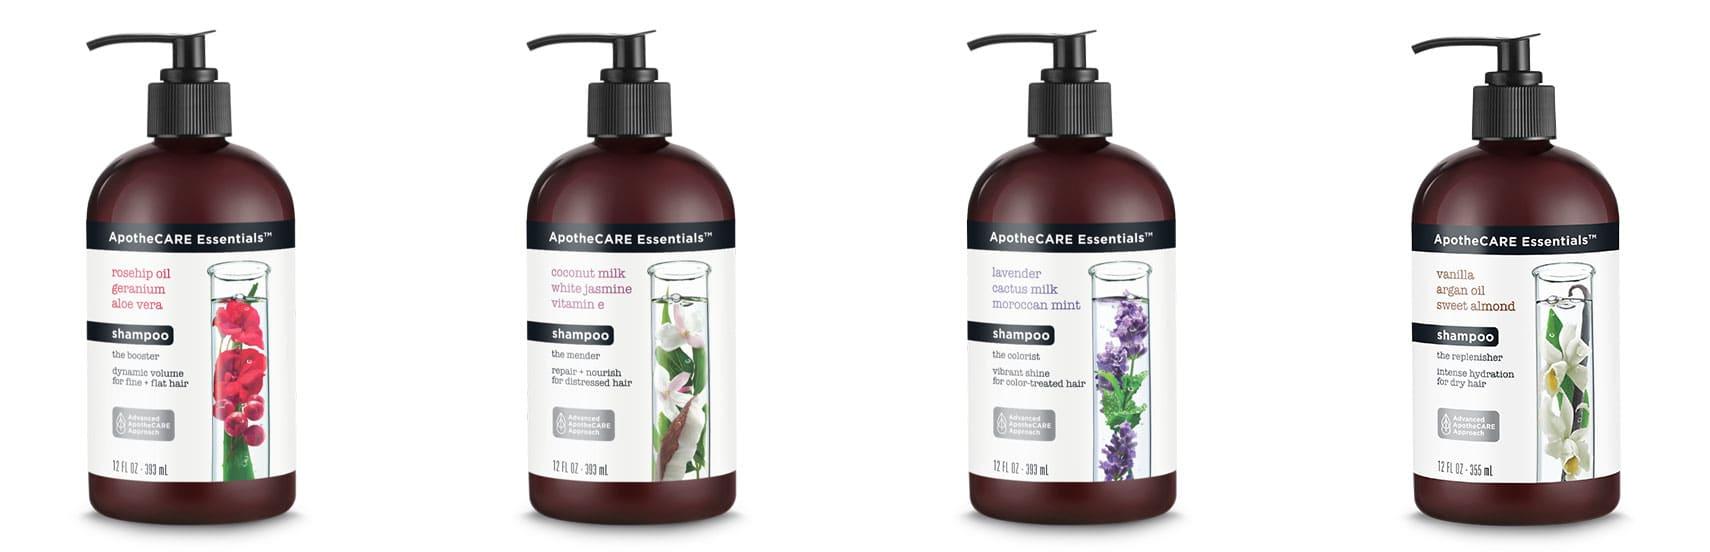 Handout: ApotheCARE Essentials Hair Range